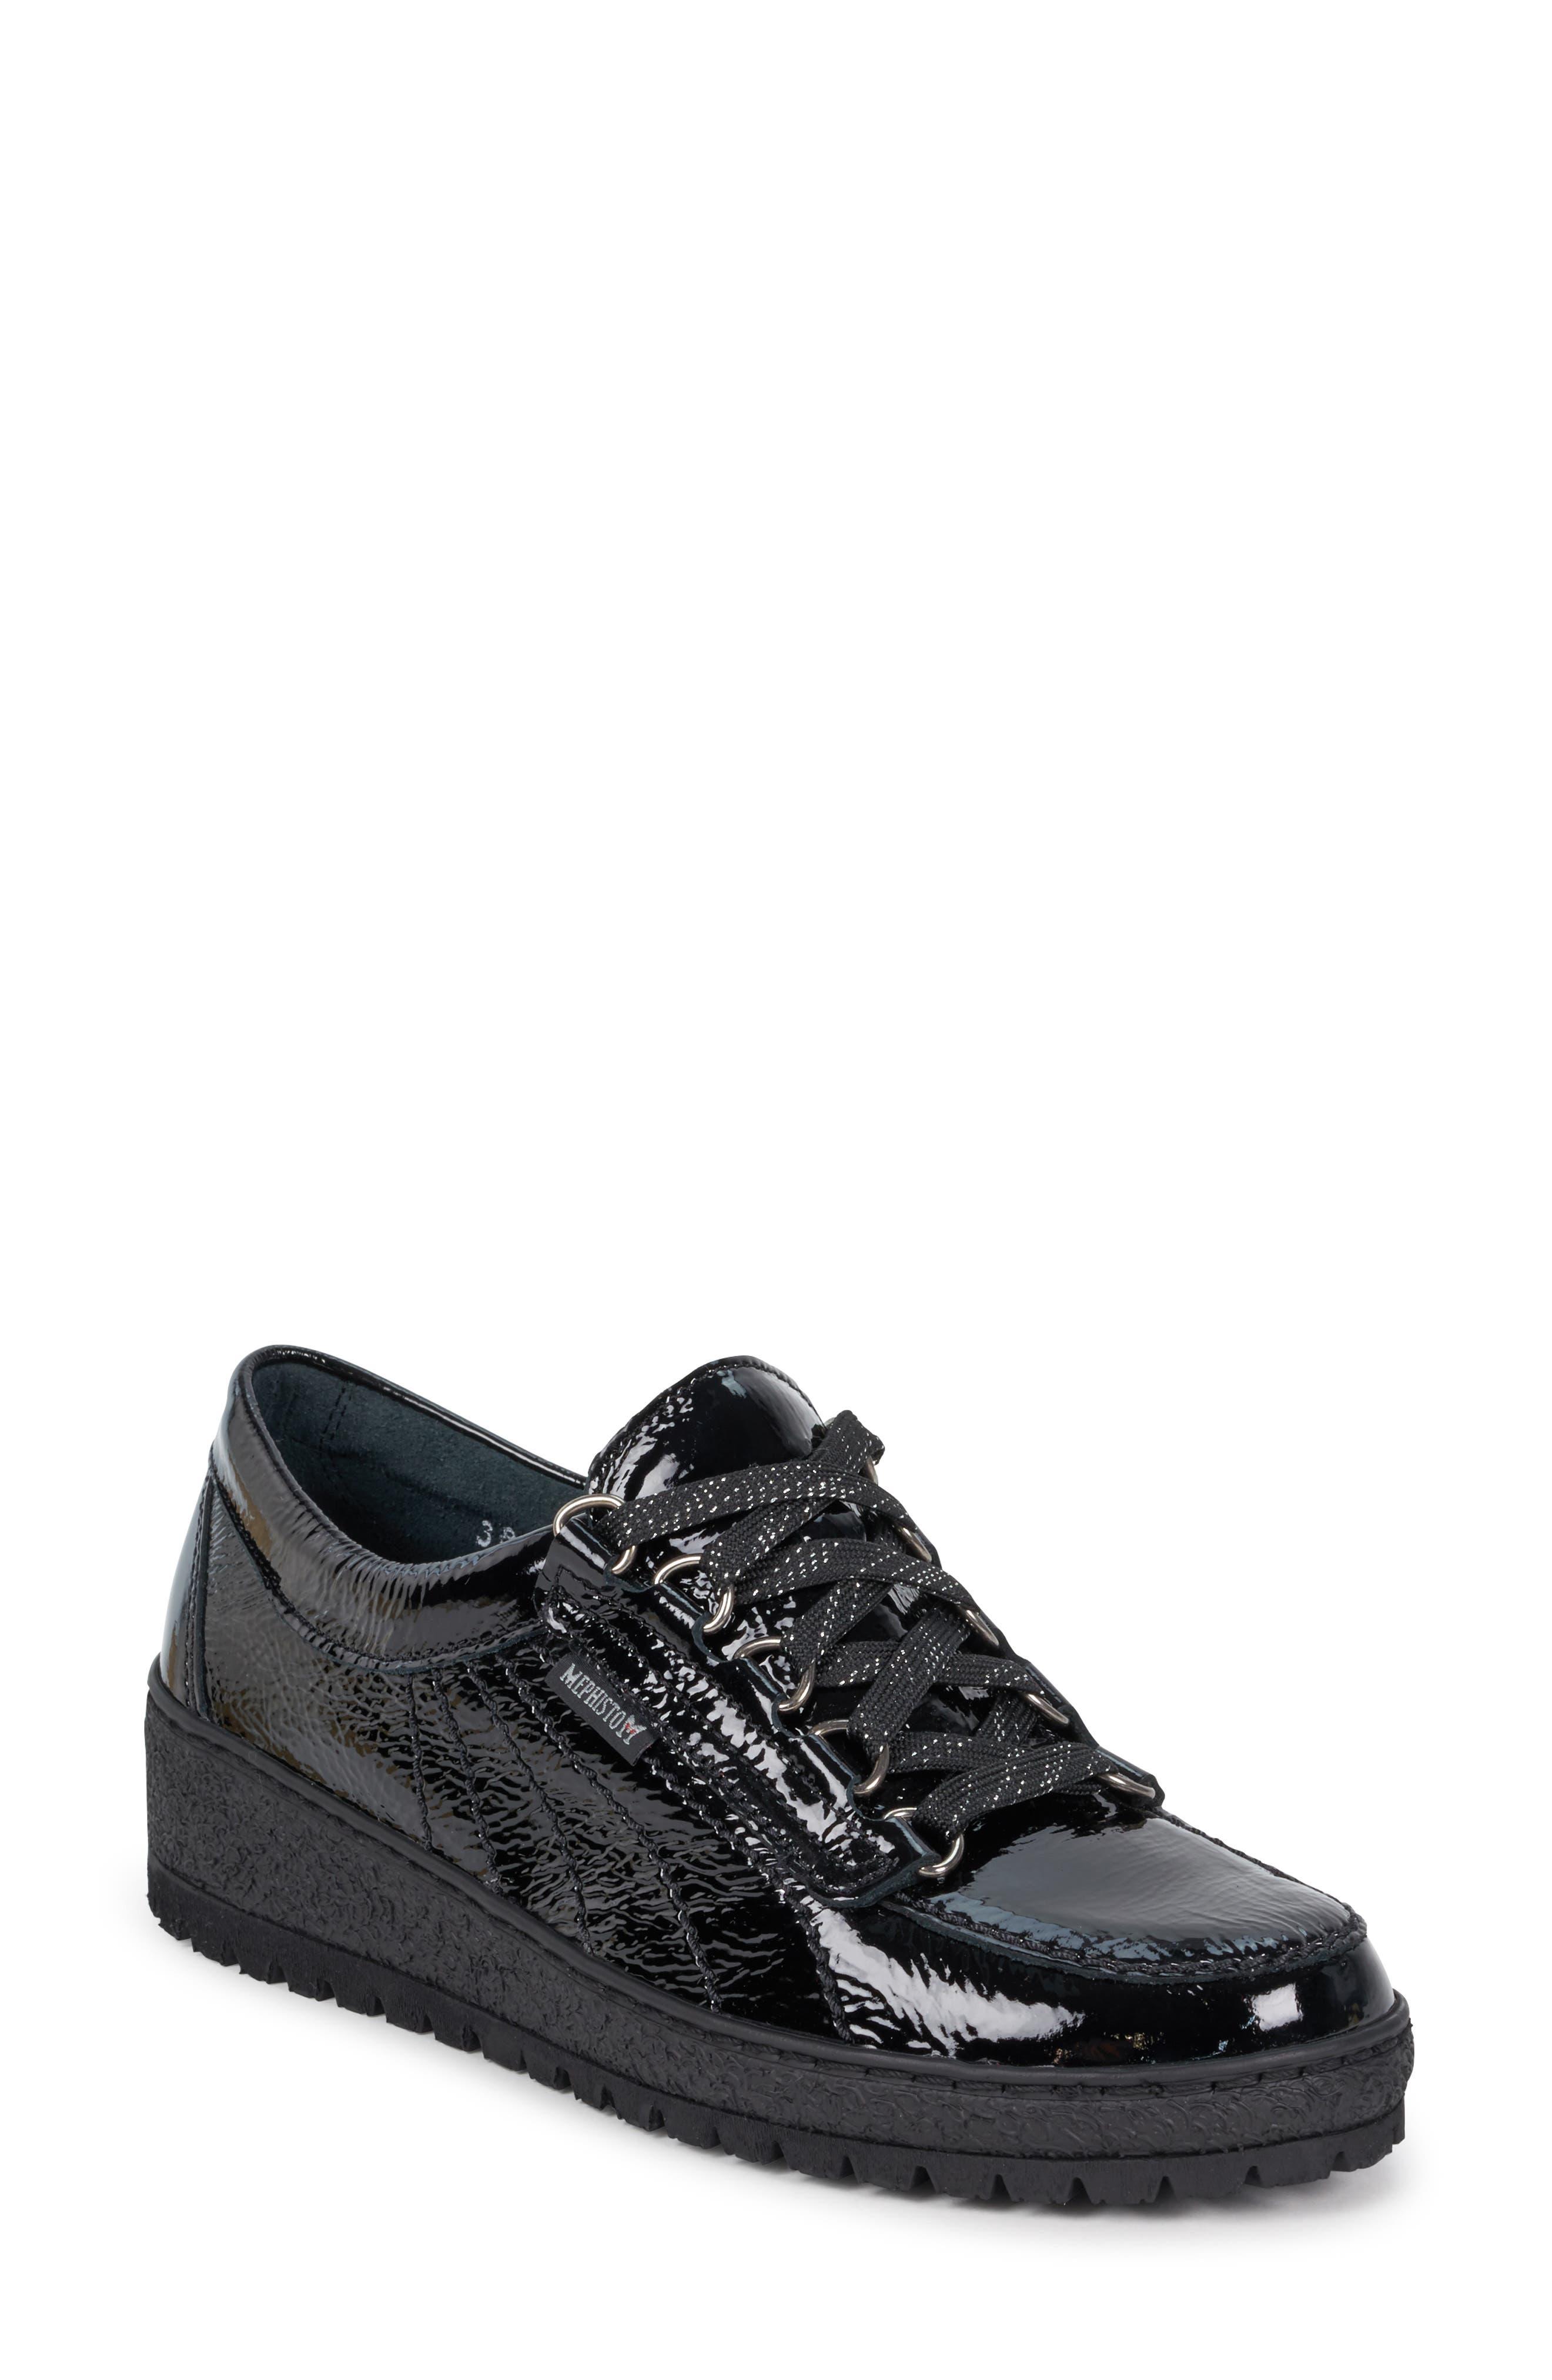 Mephisto Lady Low Top Sneaker- Black